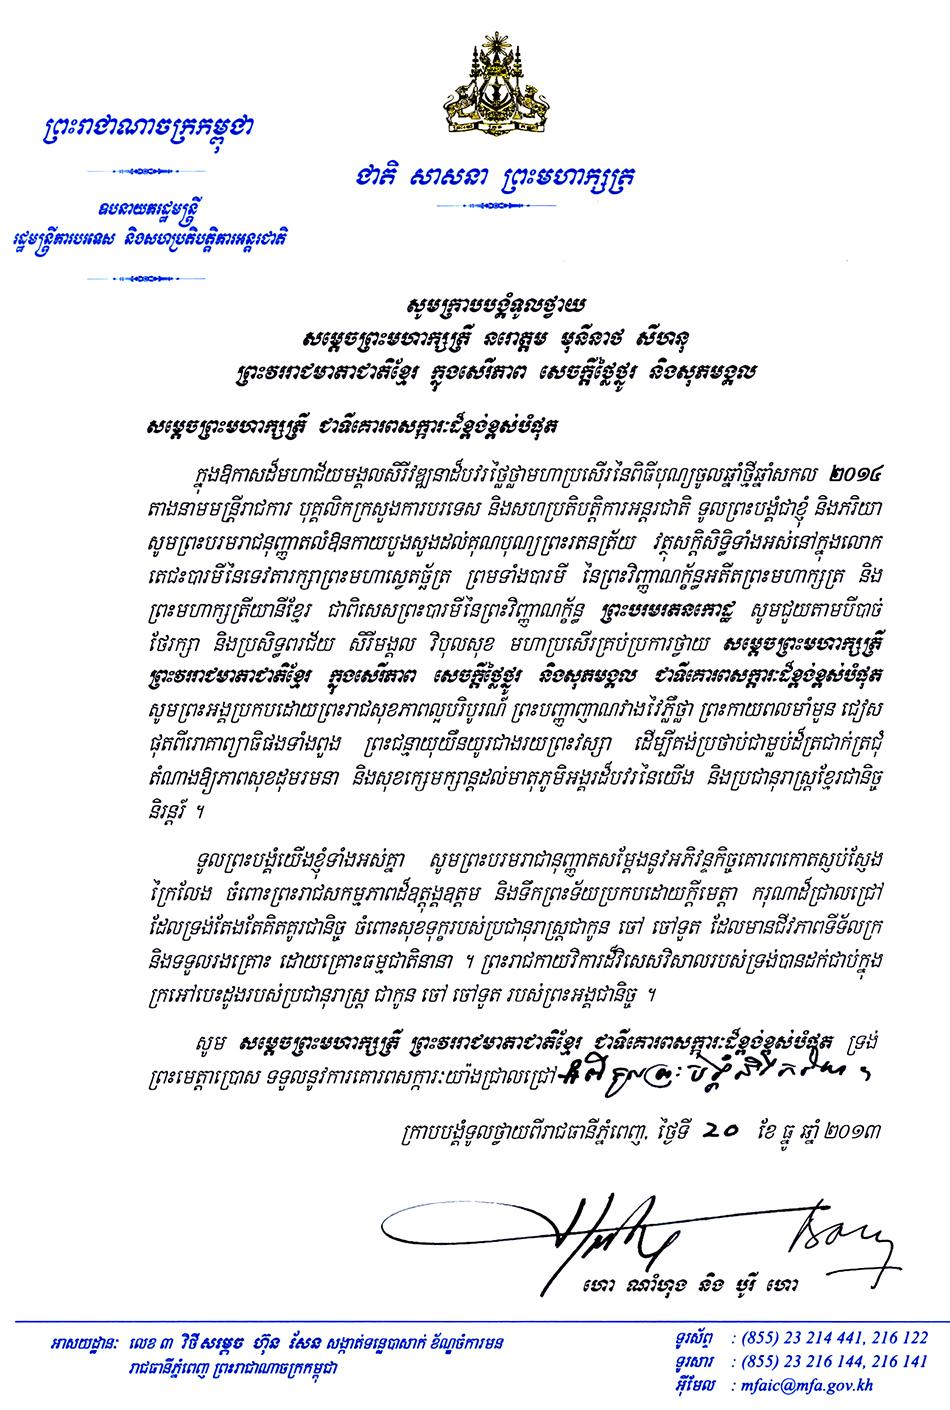 All/correspondance/CorrespondancedEtat/2013/Dcembre/id1538/photo001.jpg